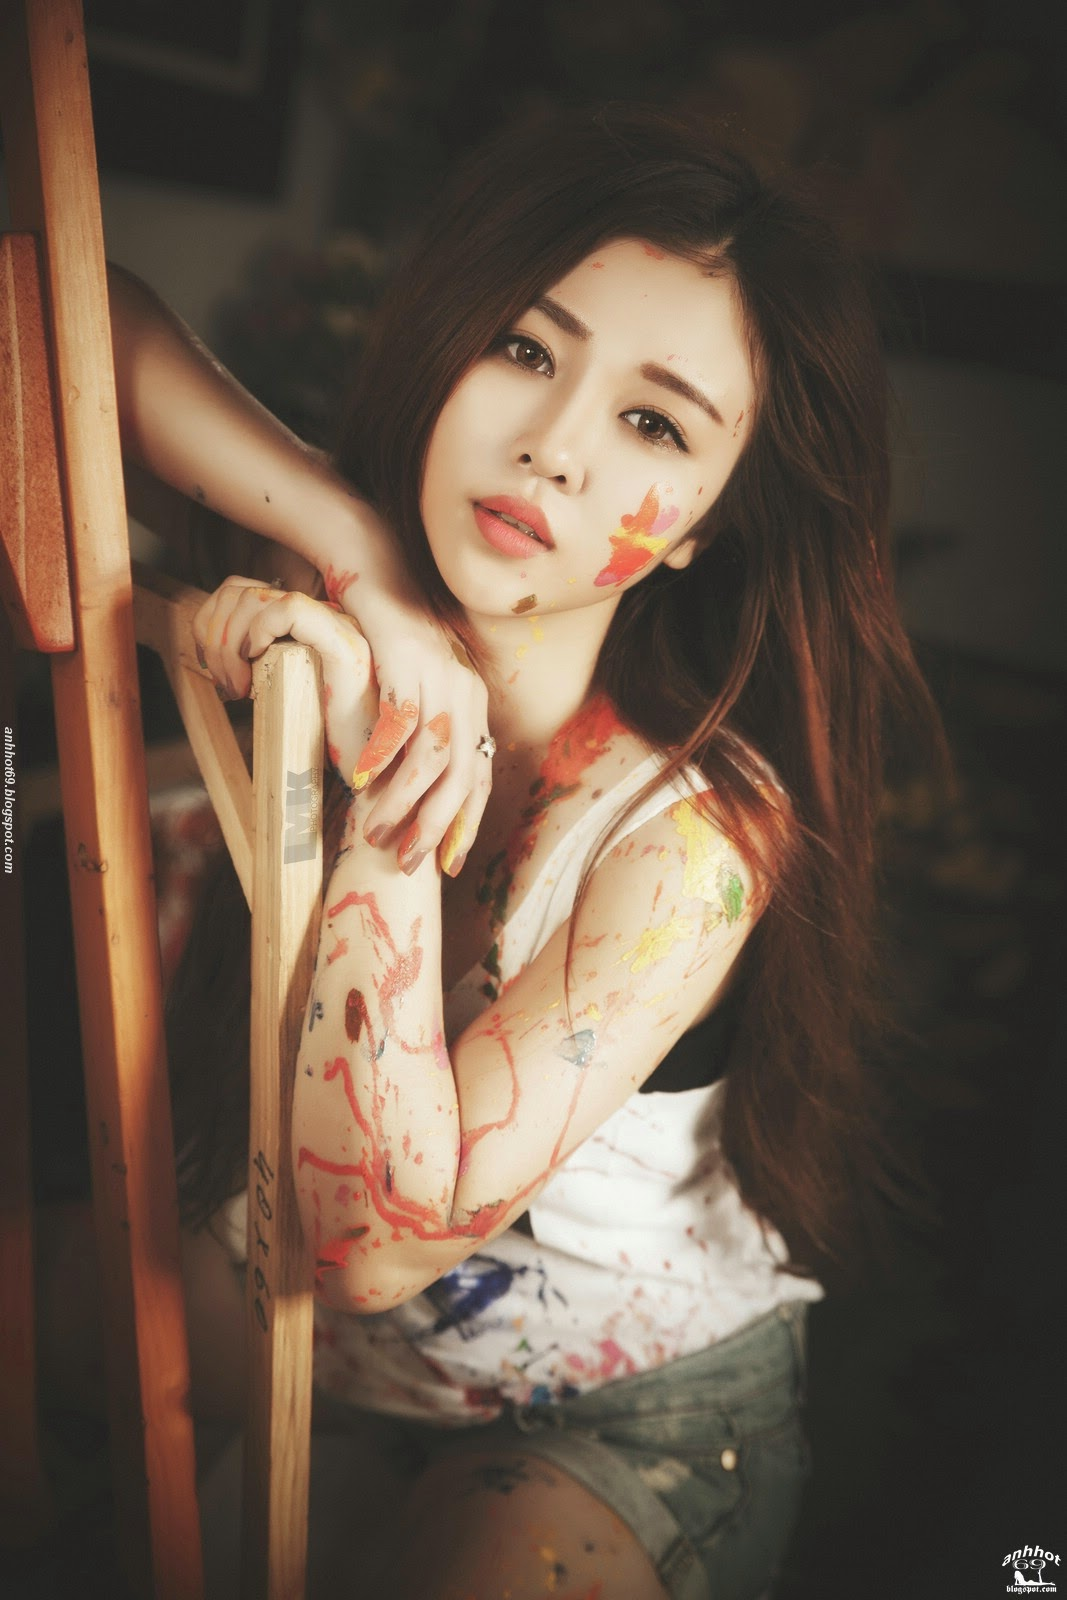 Ribi_Sachi-The_Artist-9708409443_18836e70d9_h